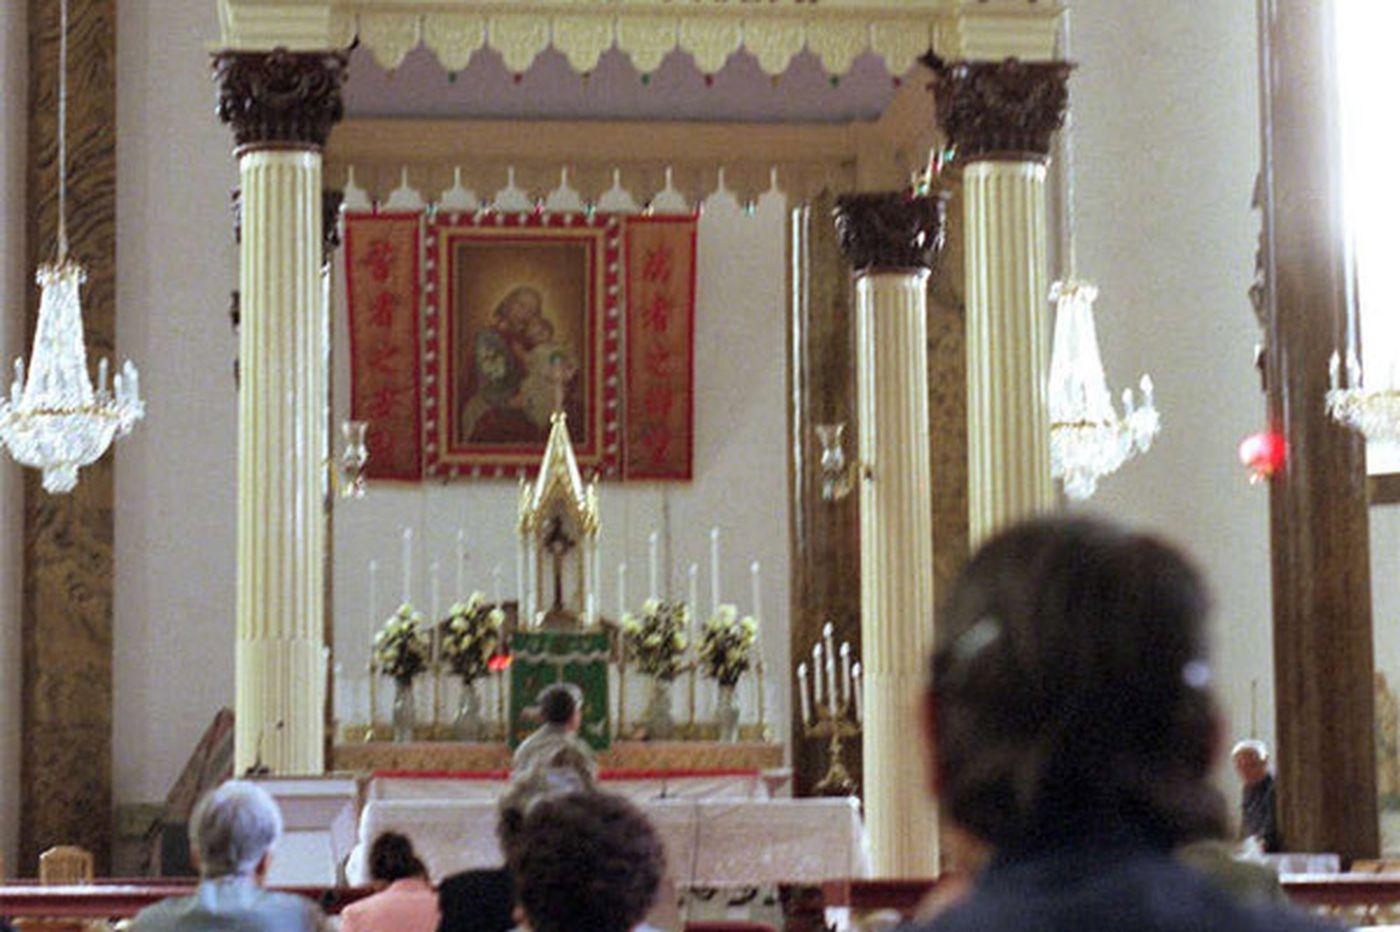 Vivid memories of religious services abroad